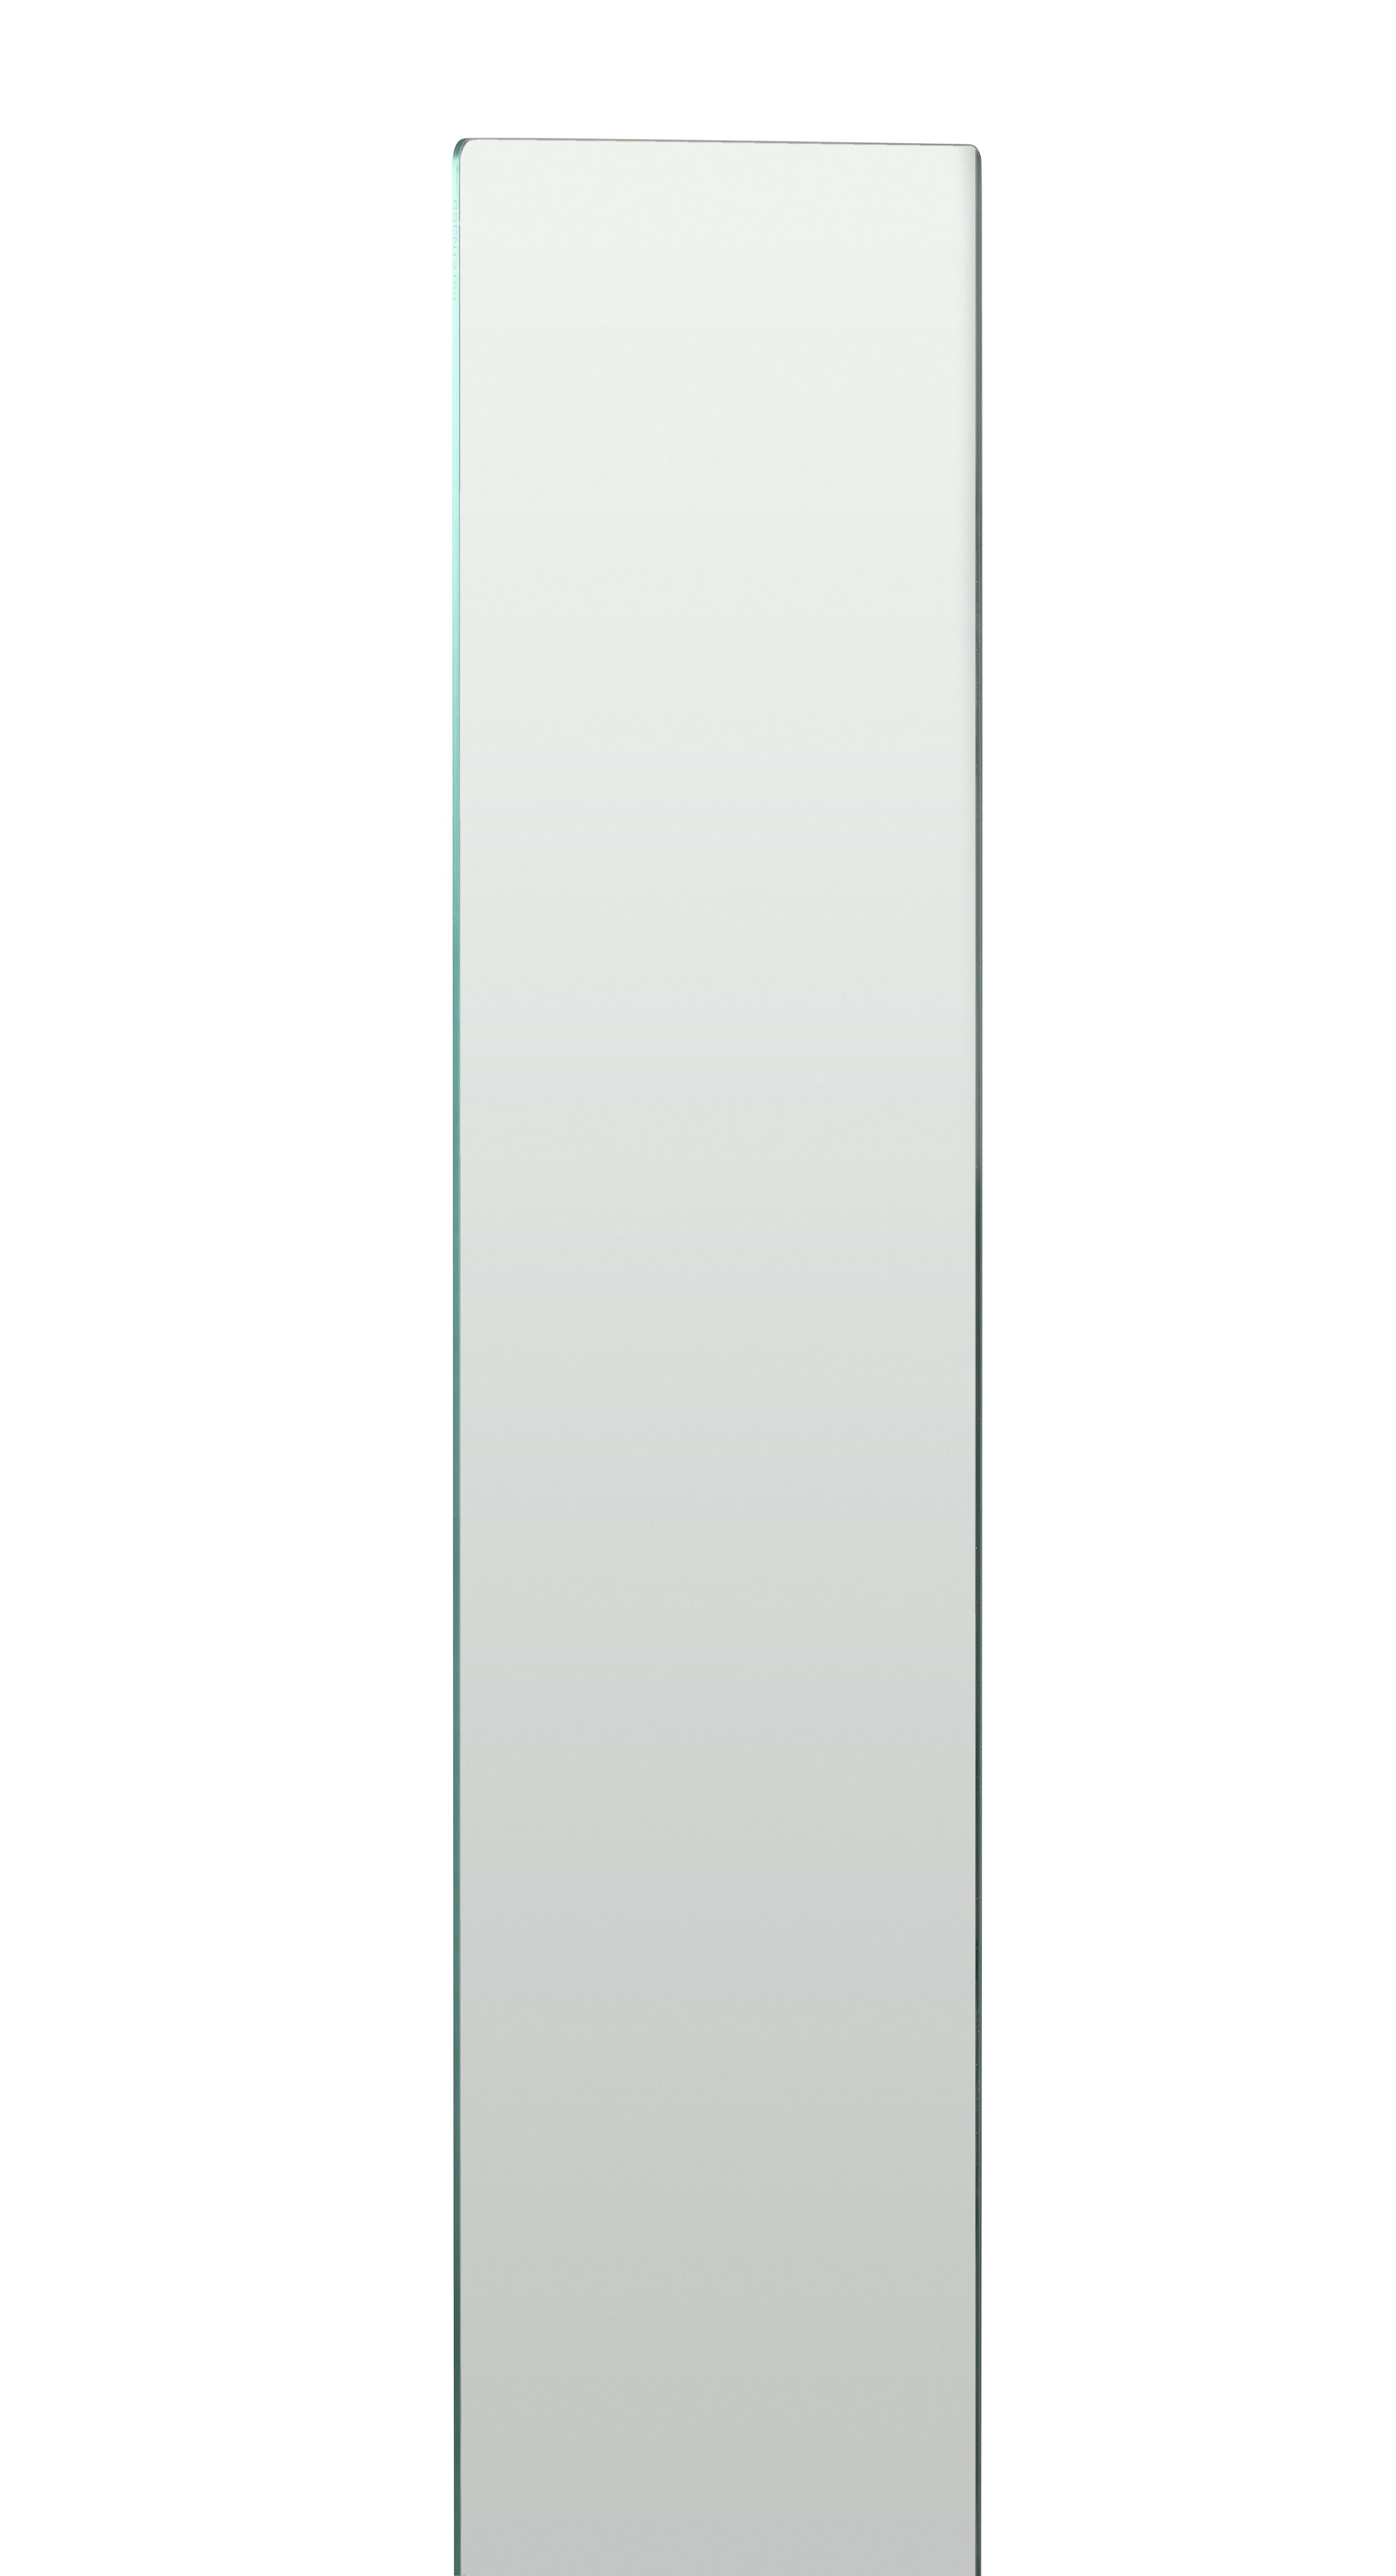 1 Immix Return Landing Glass Panel